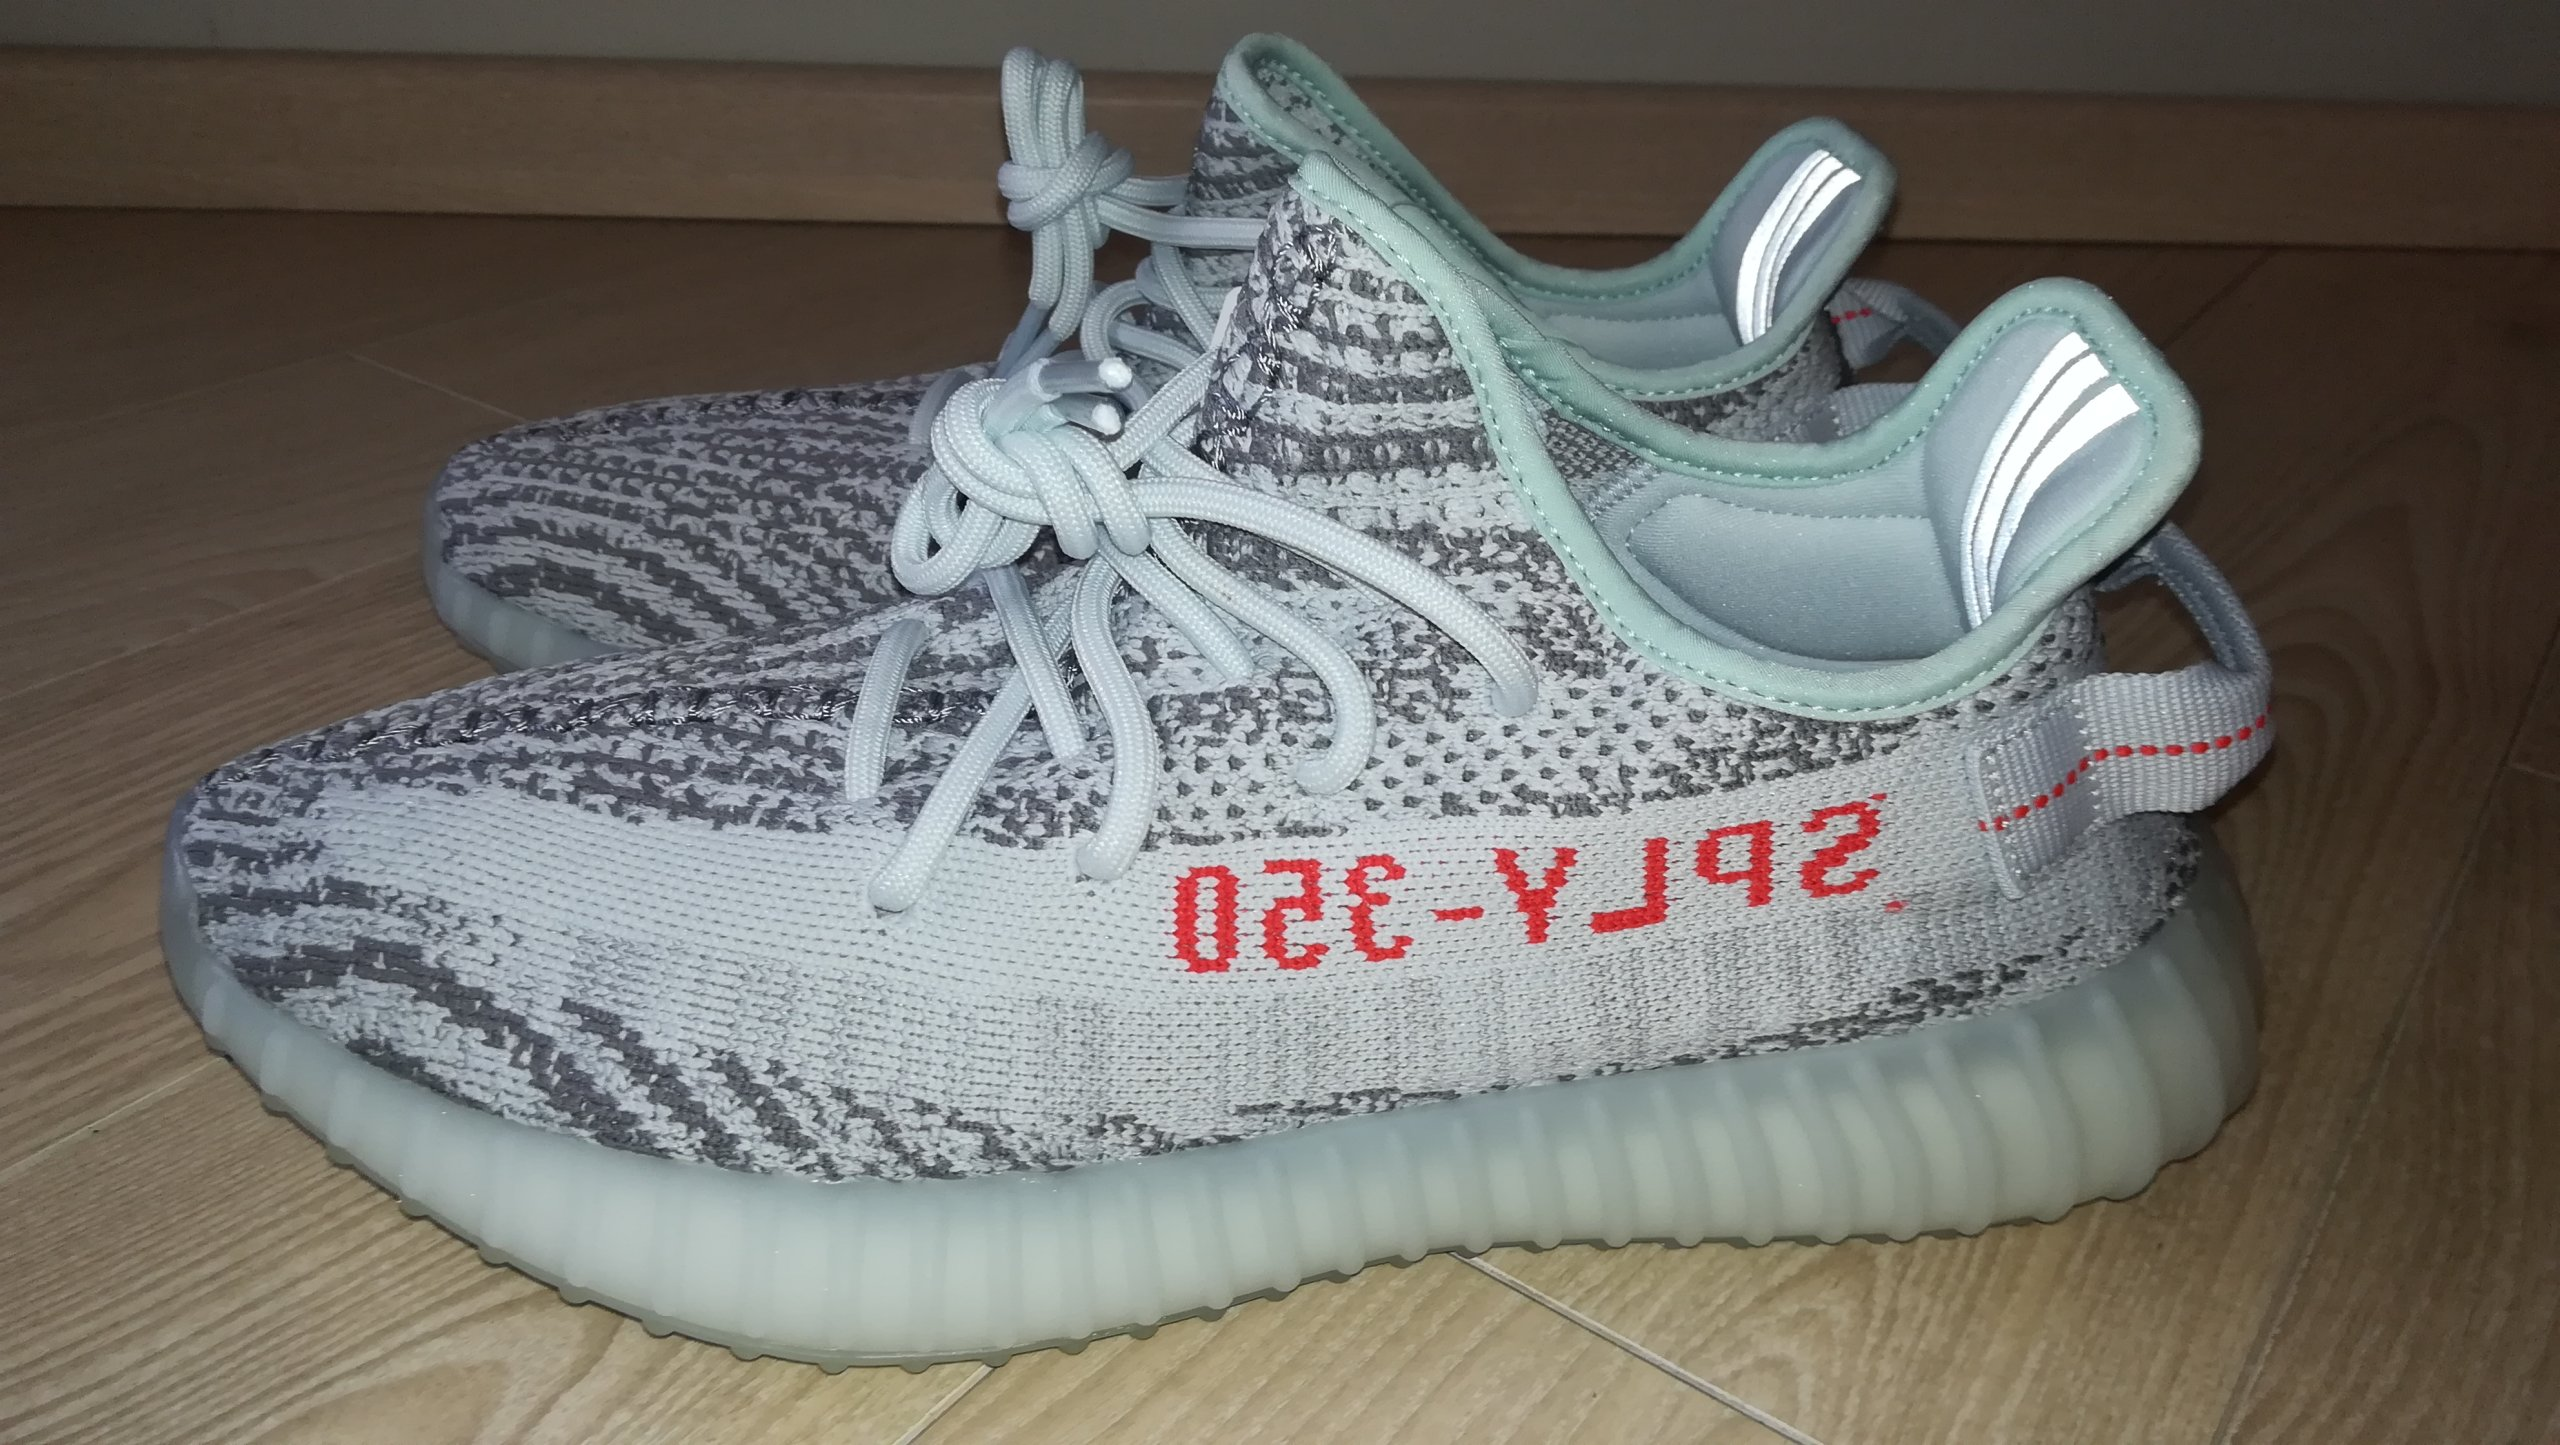 adidas yeezy boost 350 38